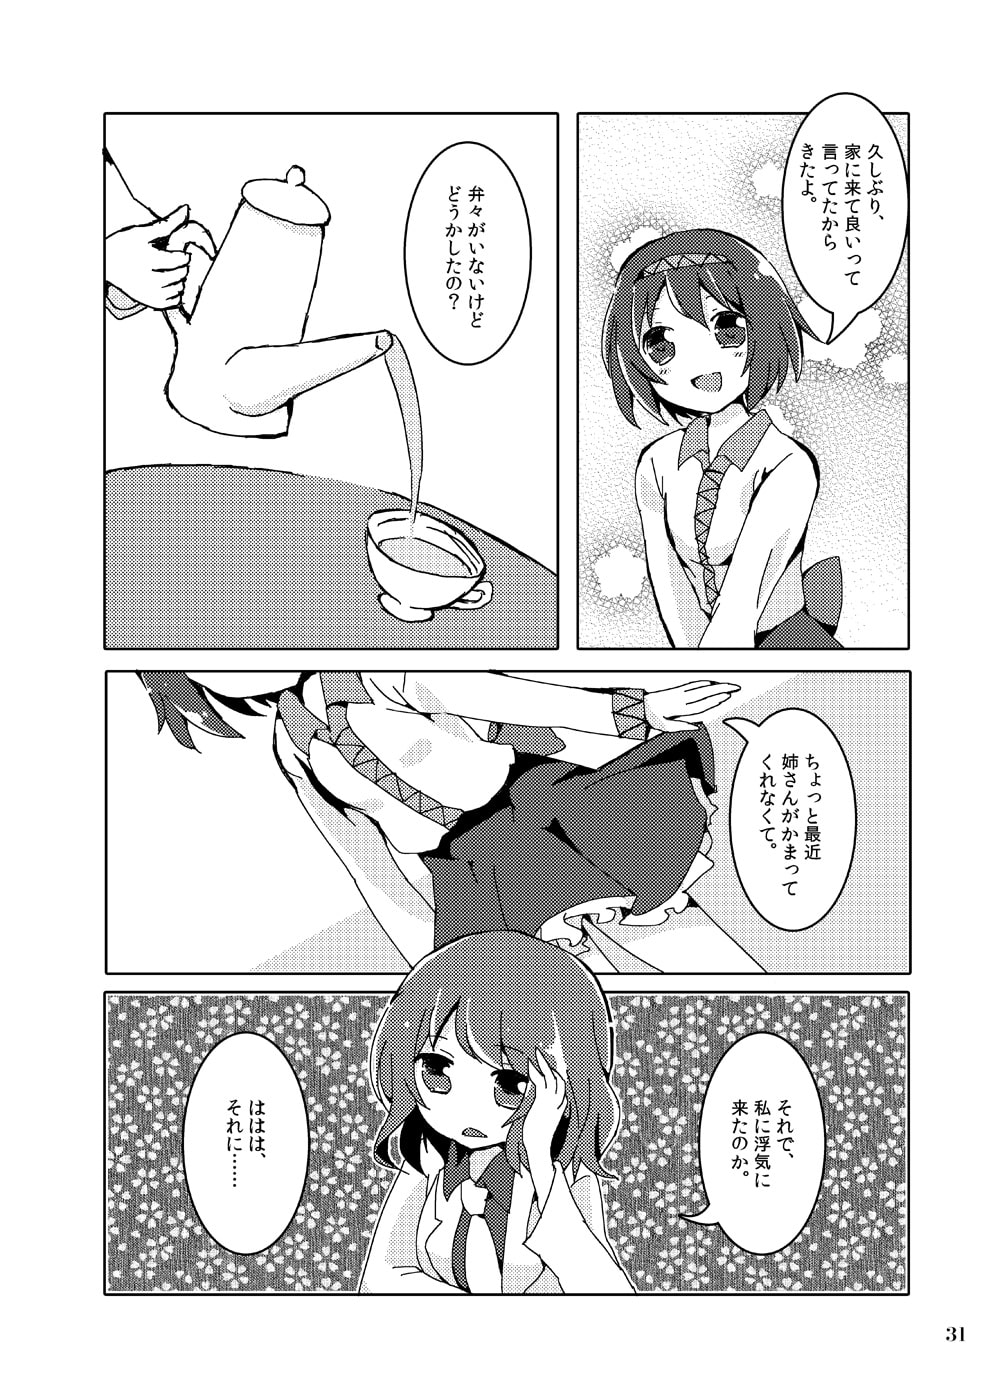 RJ336972 目覚めるEMOTION [20210729]